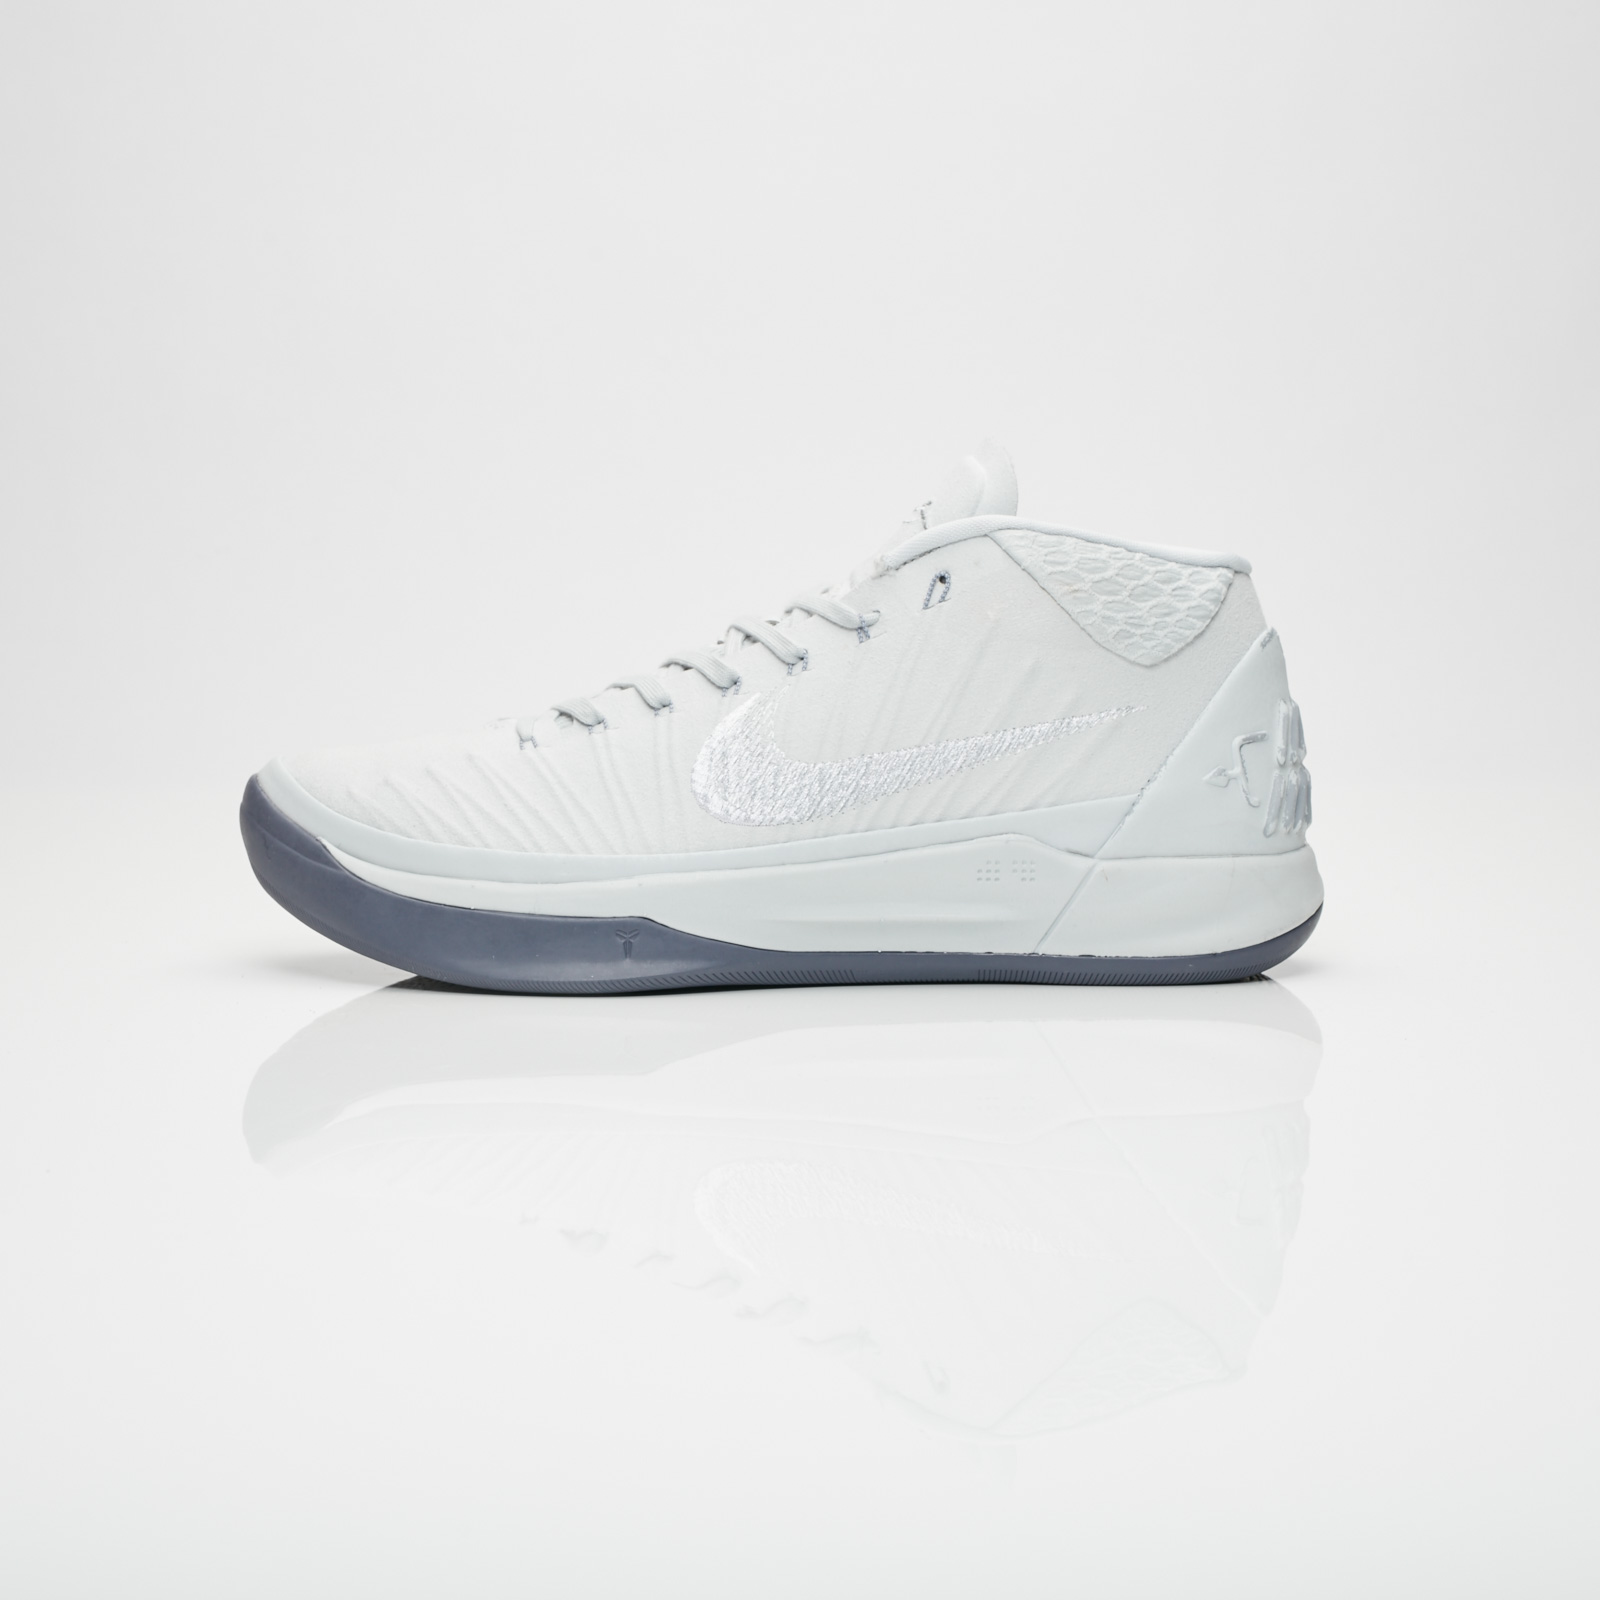 official photos 4f00d fa6d0 Nike Kobe AD - 922482-004 - Sneakersnstuff   sneakers   streetwear online  since 1999